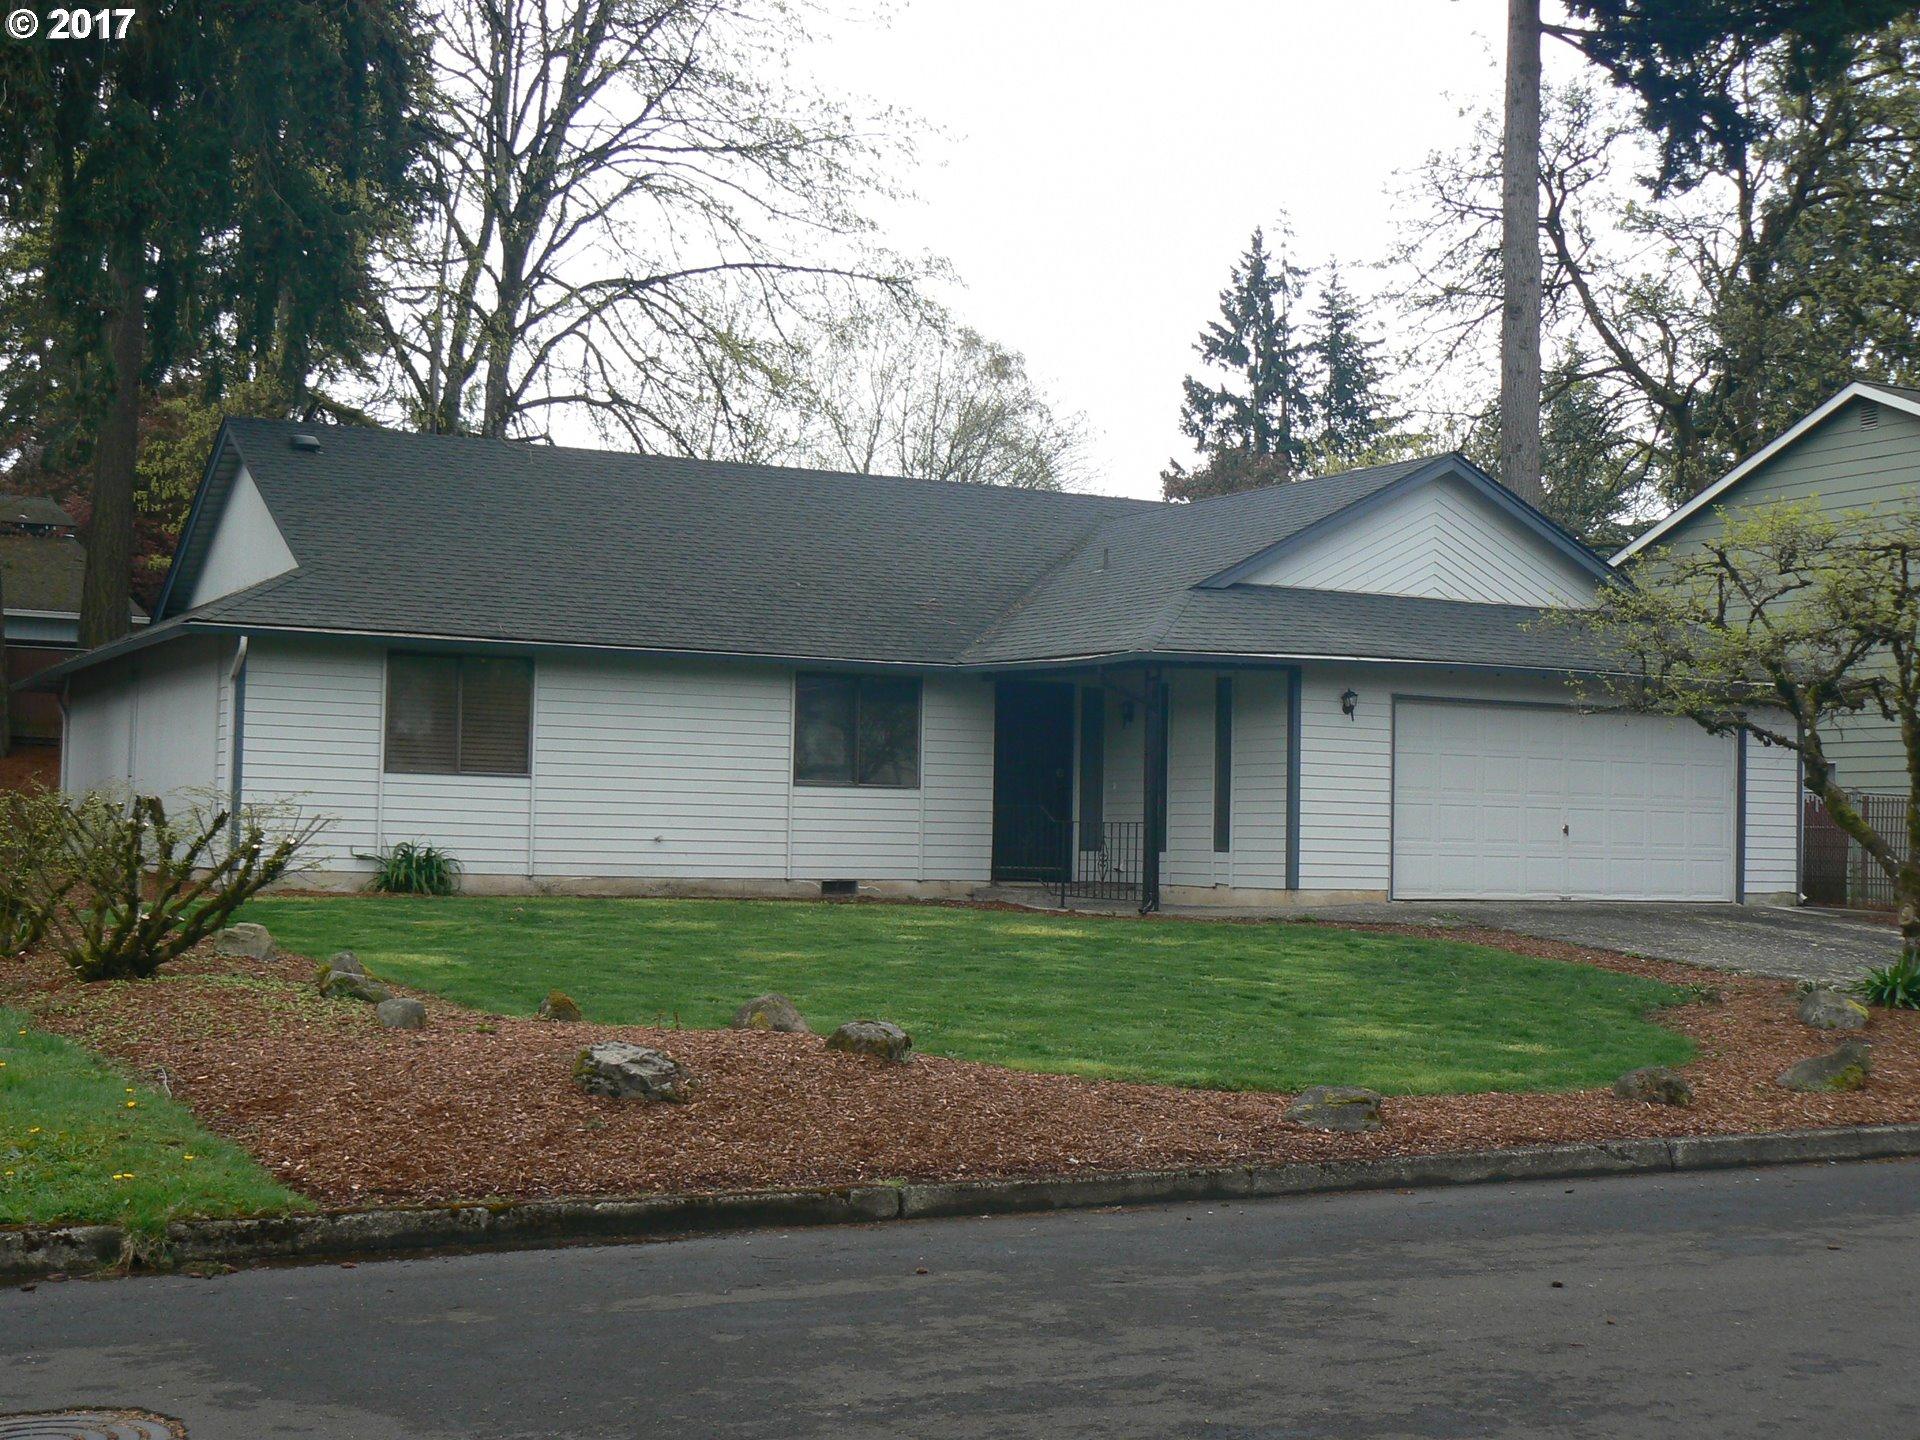 2107 NE 90TH ST, Vancouver, WA 98665